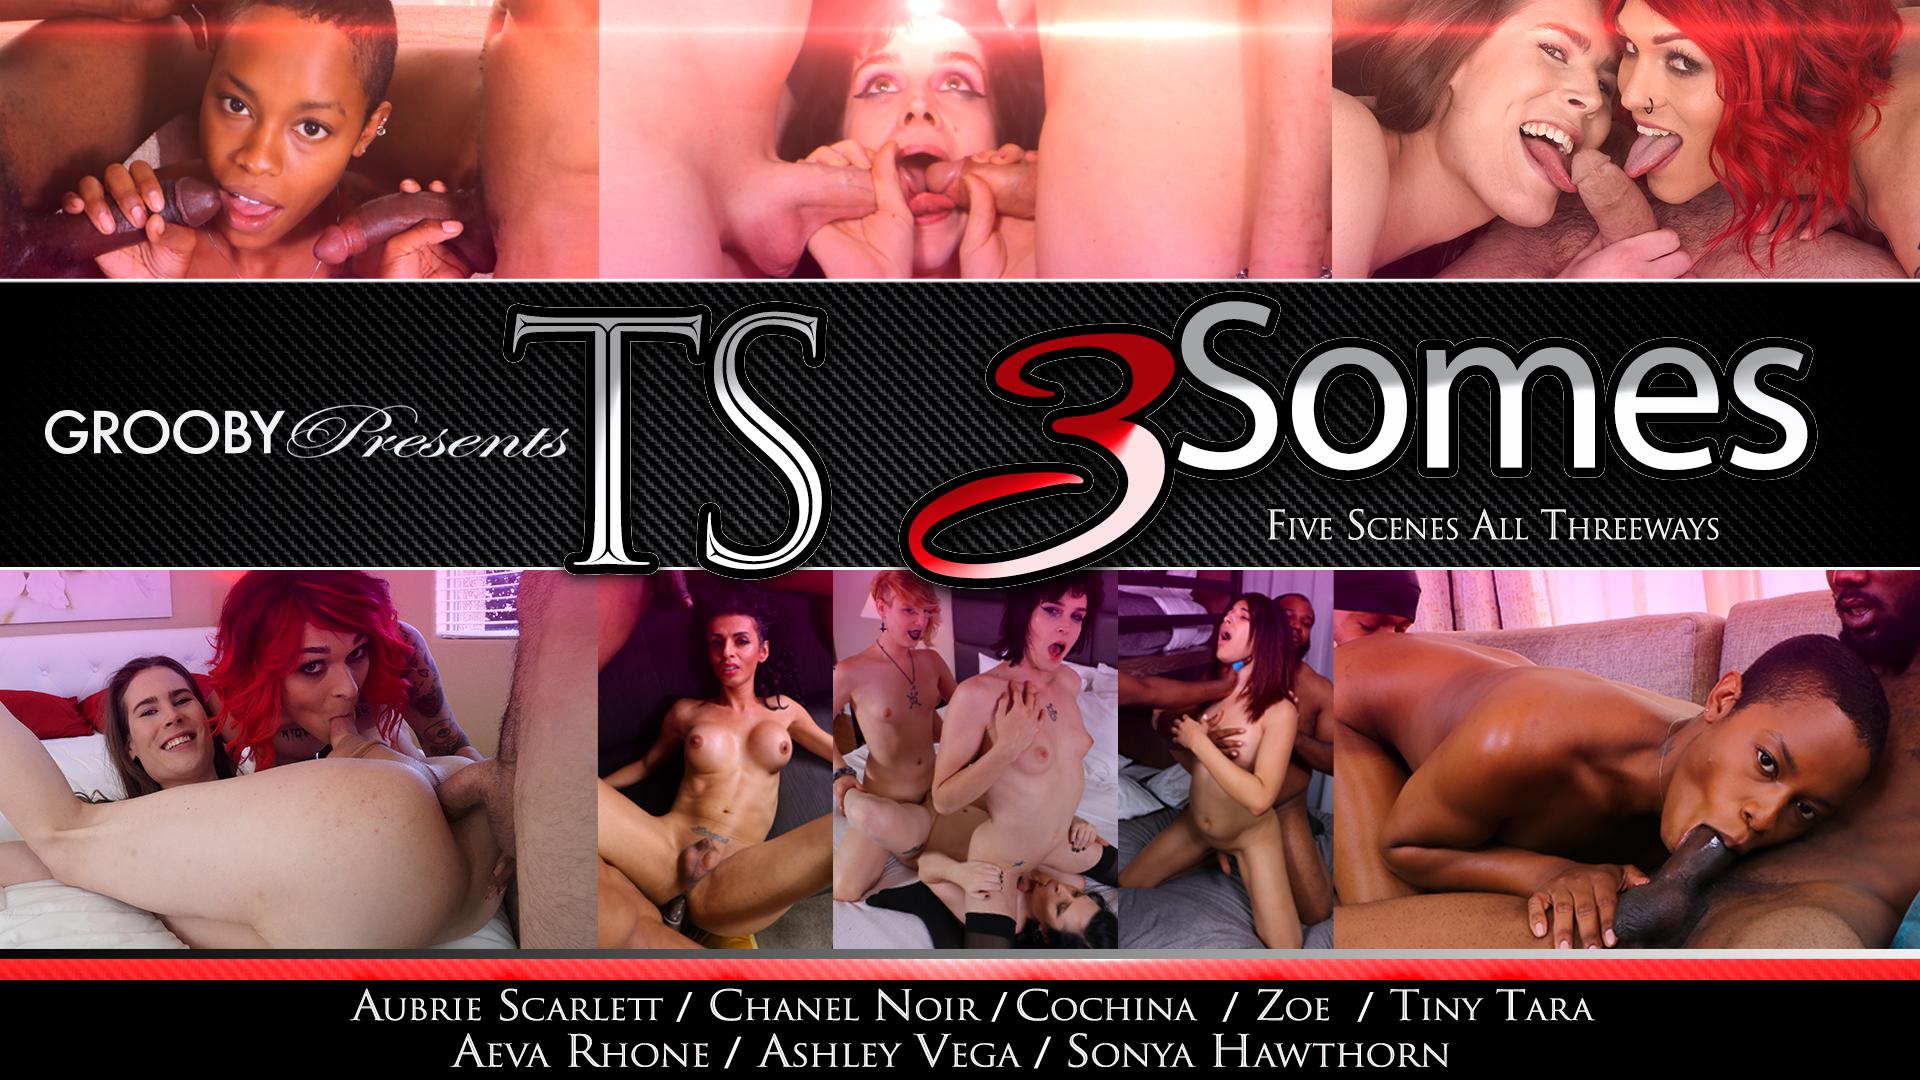 TS 3 Somes DVD Trailer